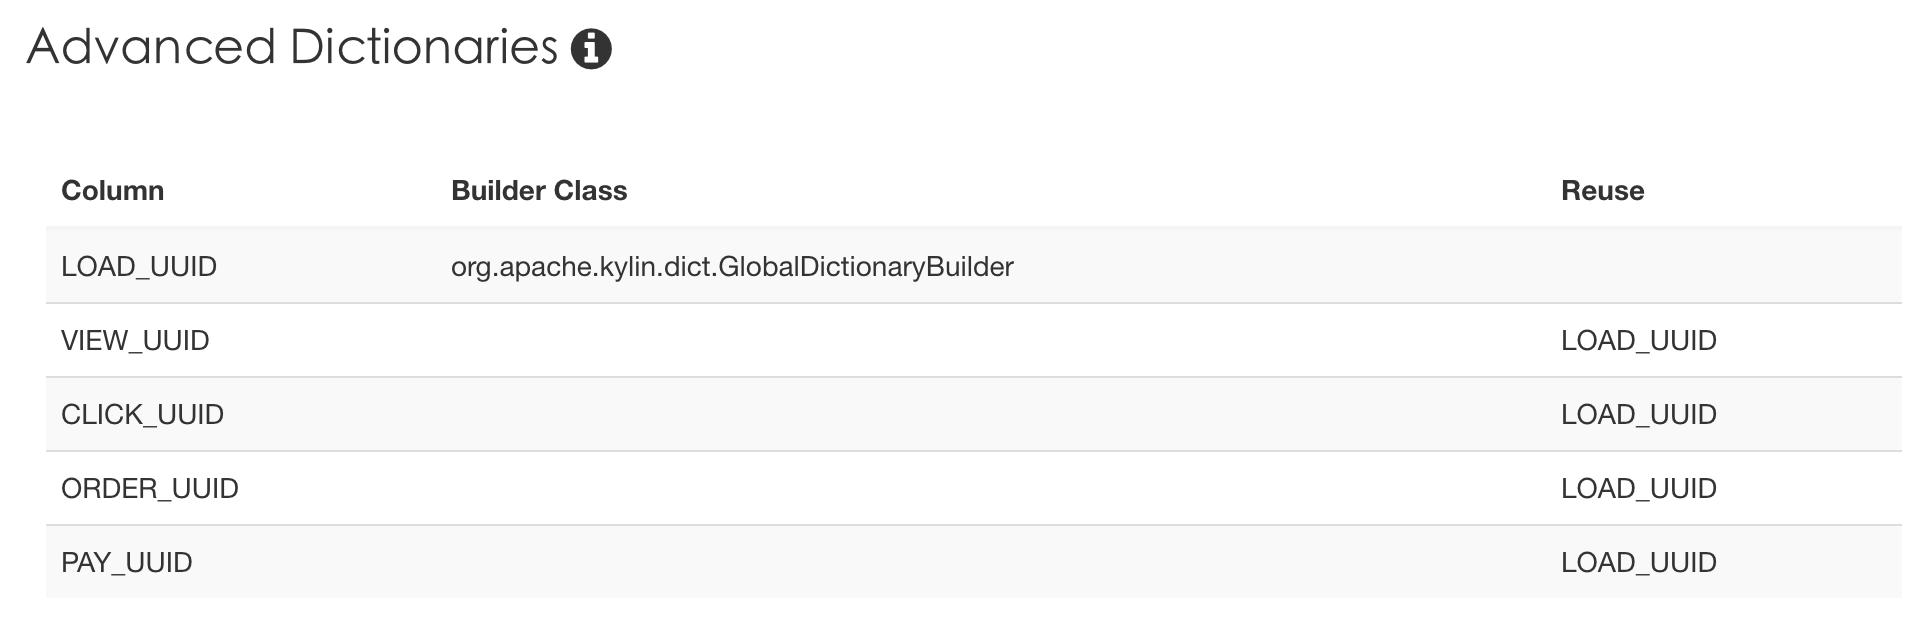 global-dict-reuse.png-81.2kB